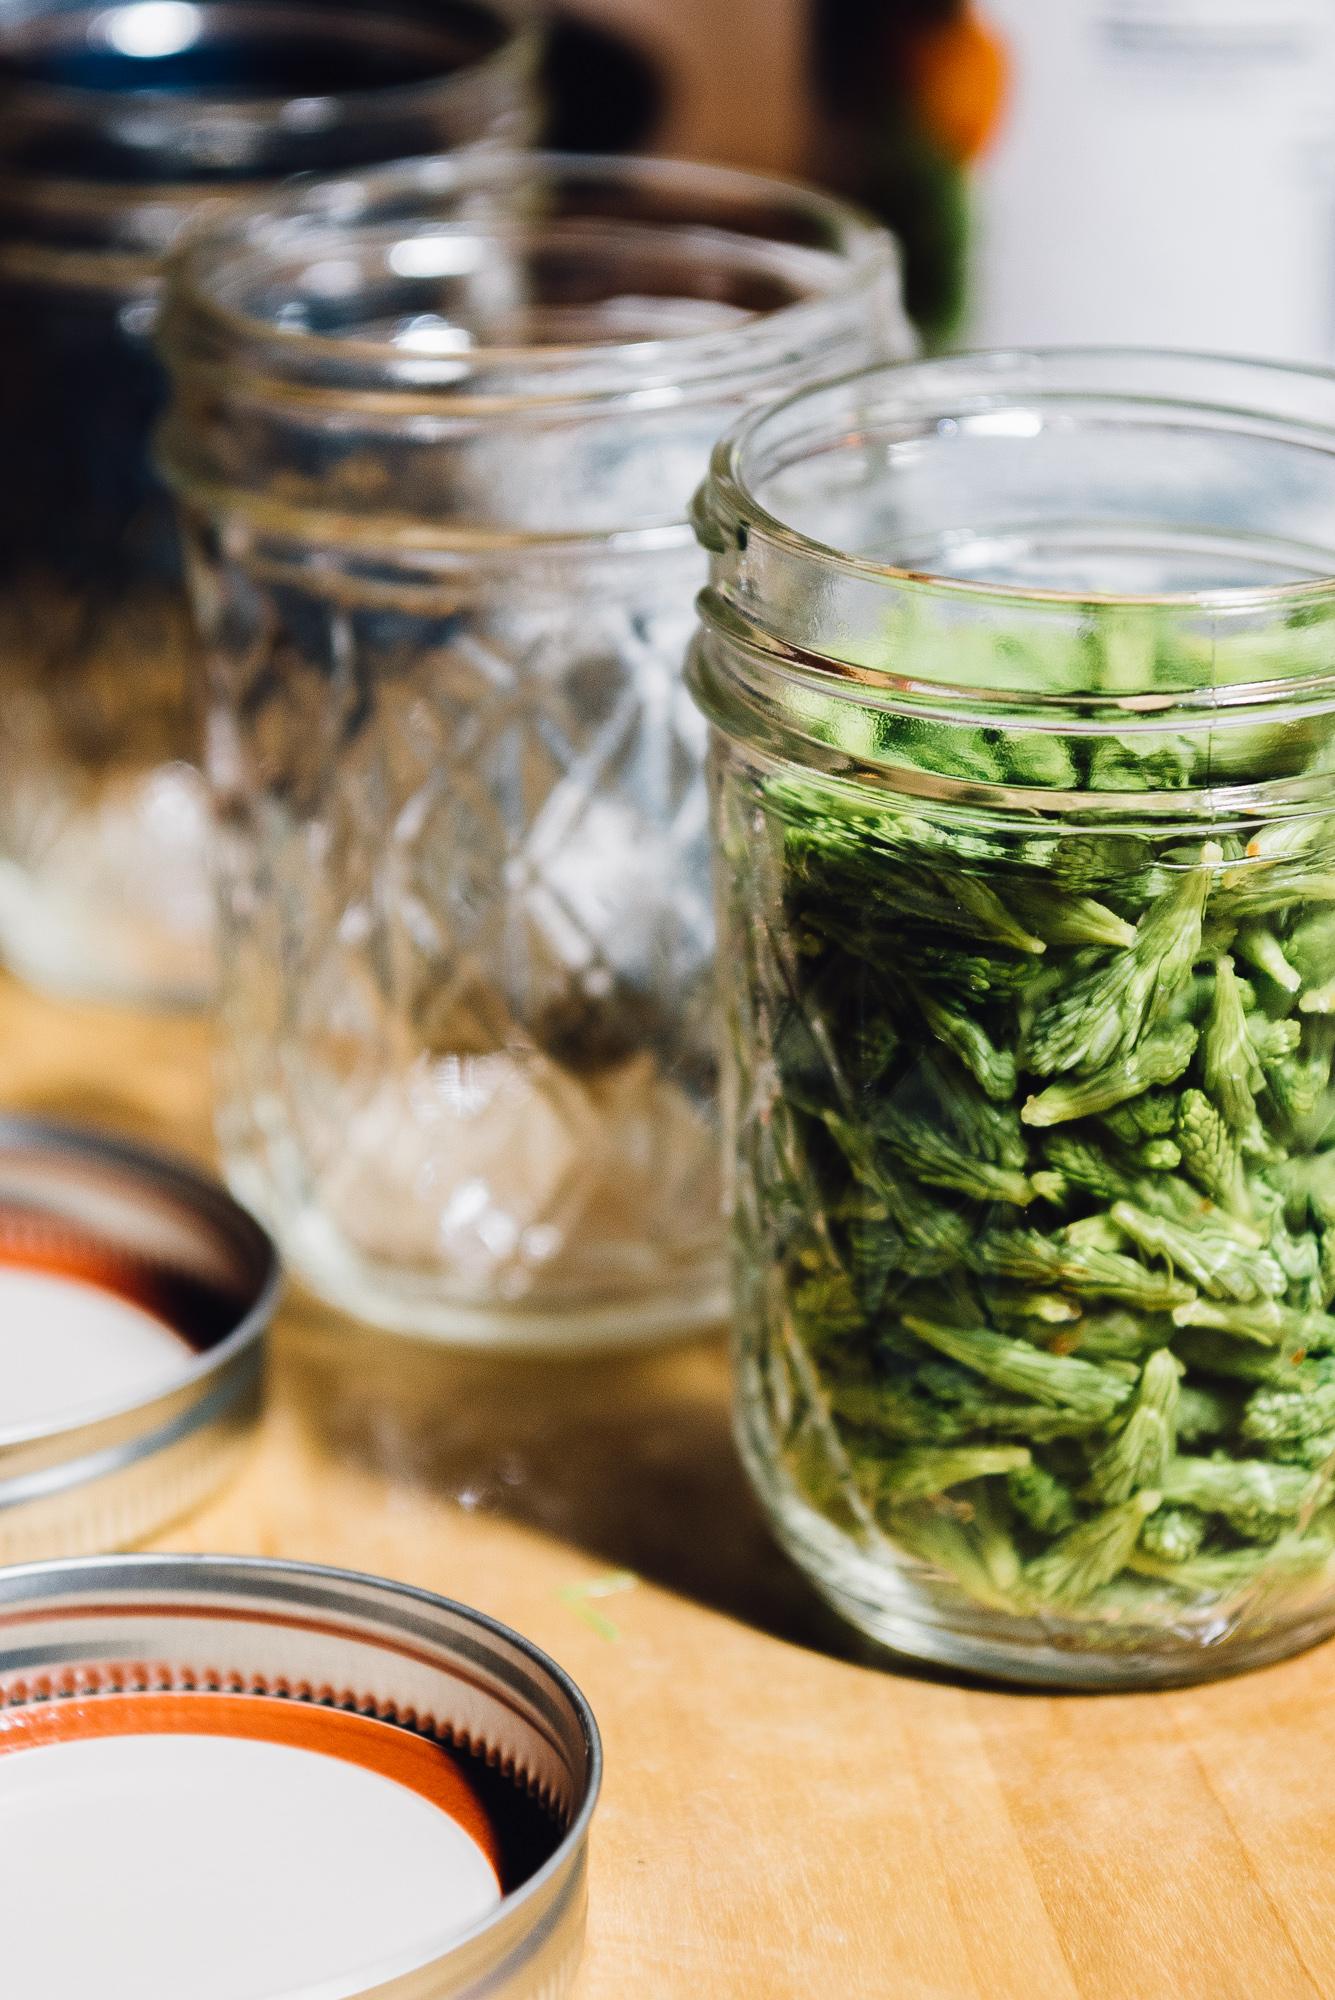 Preparing to pickle